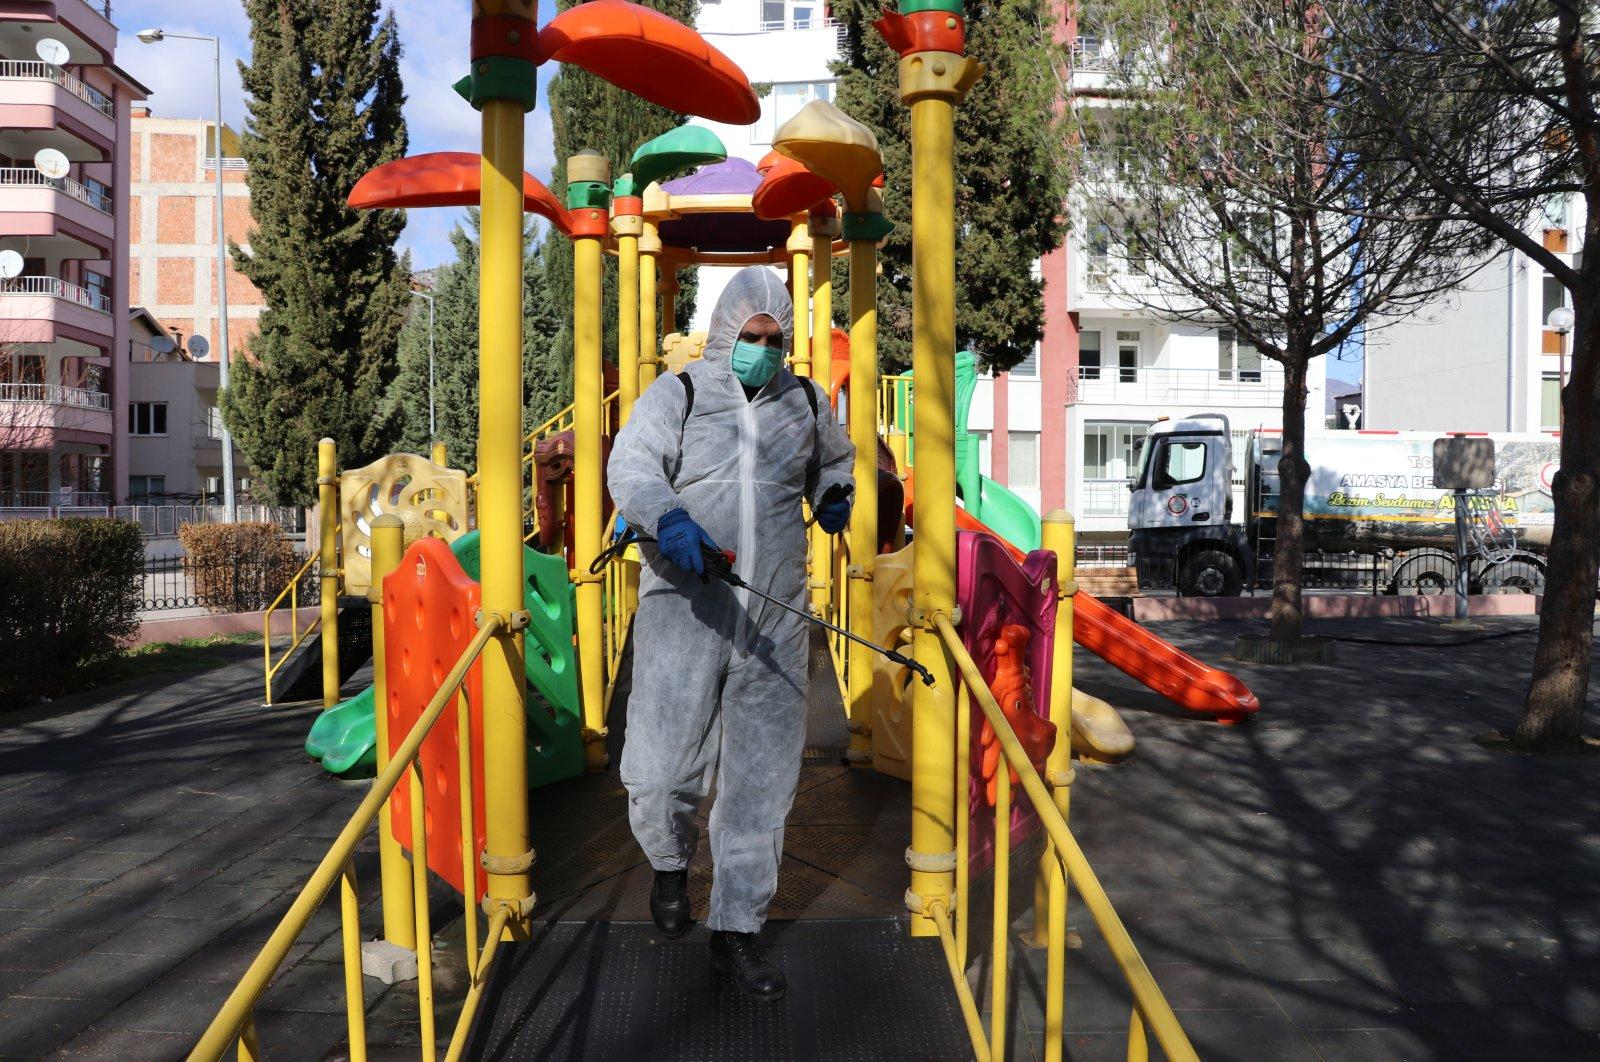 An Amasya Municipality worker disinfects a children's park in Amasya, northern Turkey, March 5, 2021. (AA Photo)